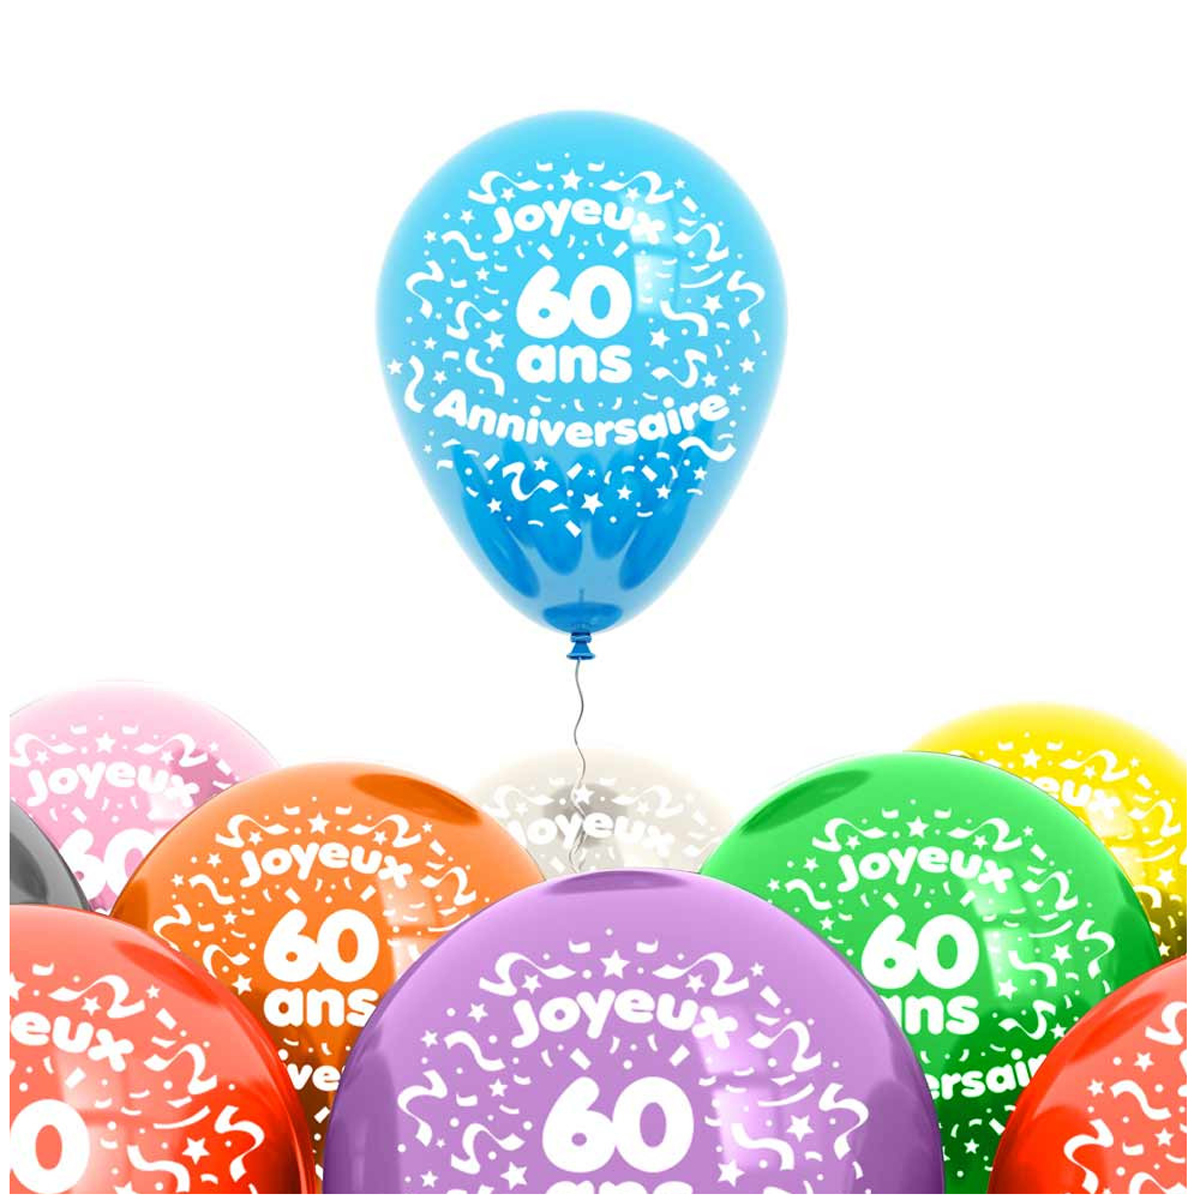 Sachet de 8 ballons \'60 ans\' - 30 cm - [A0739]